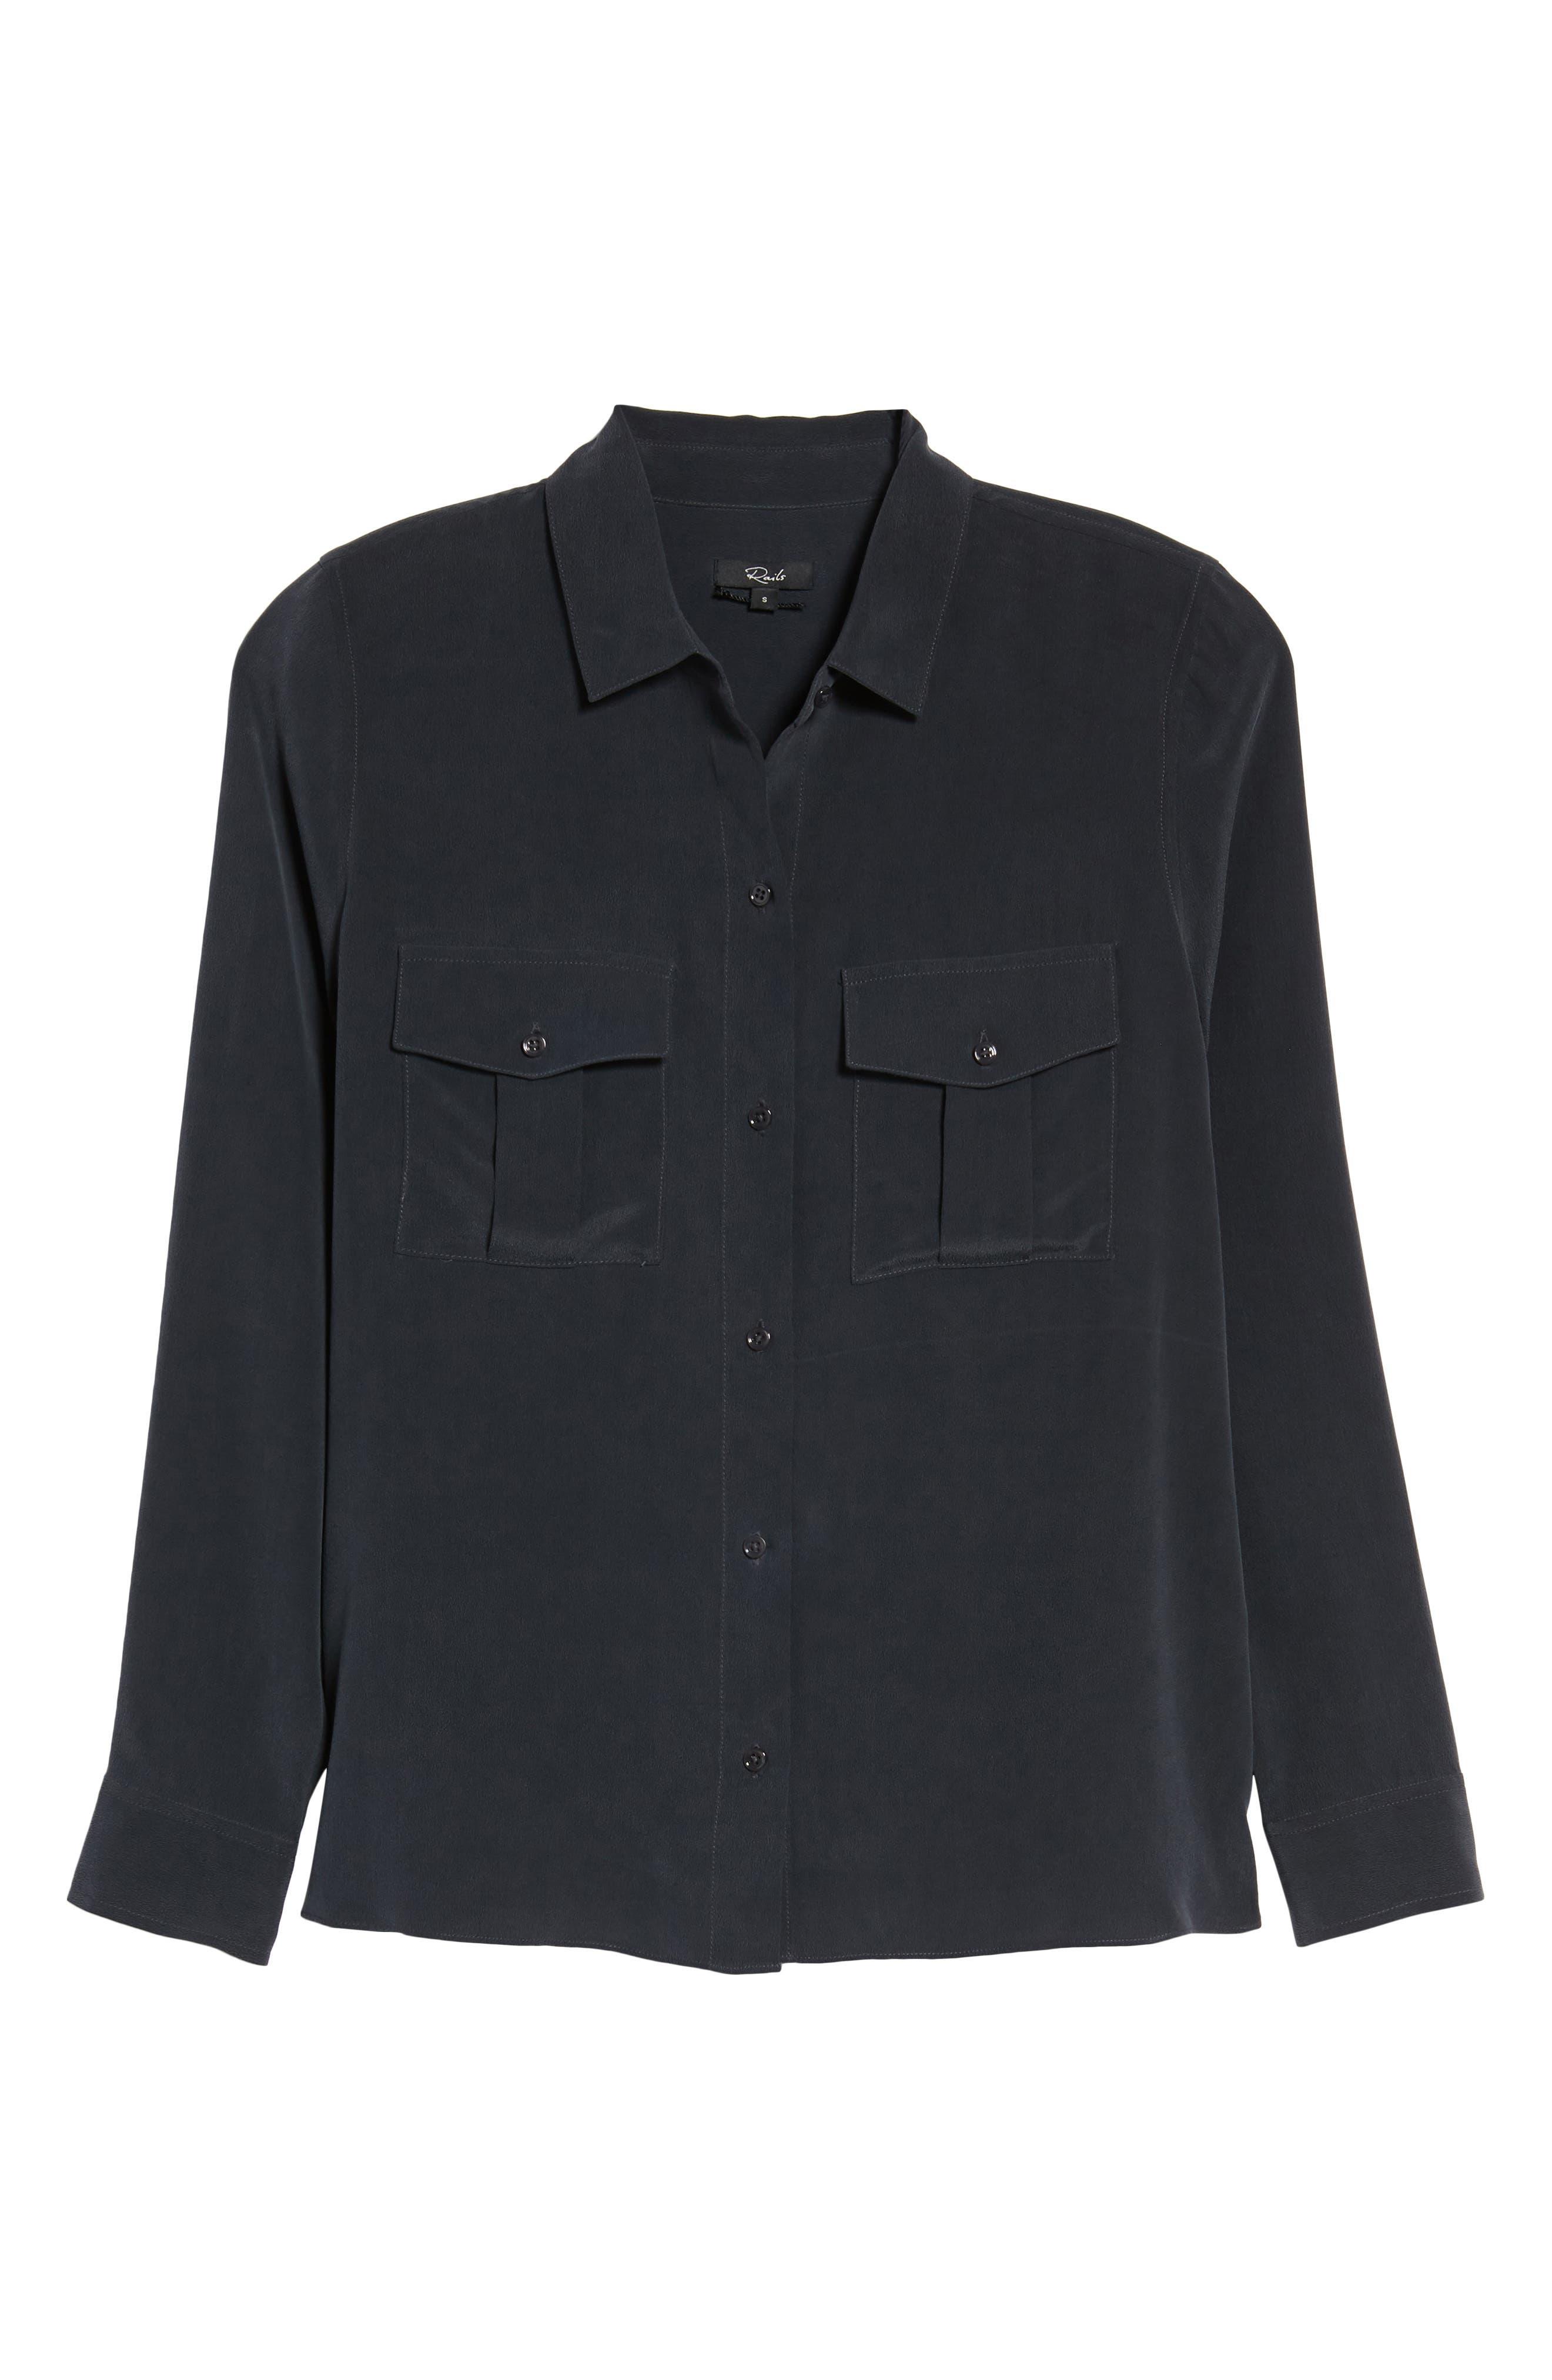 RAILS, Rhett Silk Shirt, Alternate thumbnail 6, color, 021